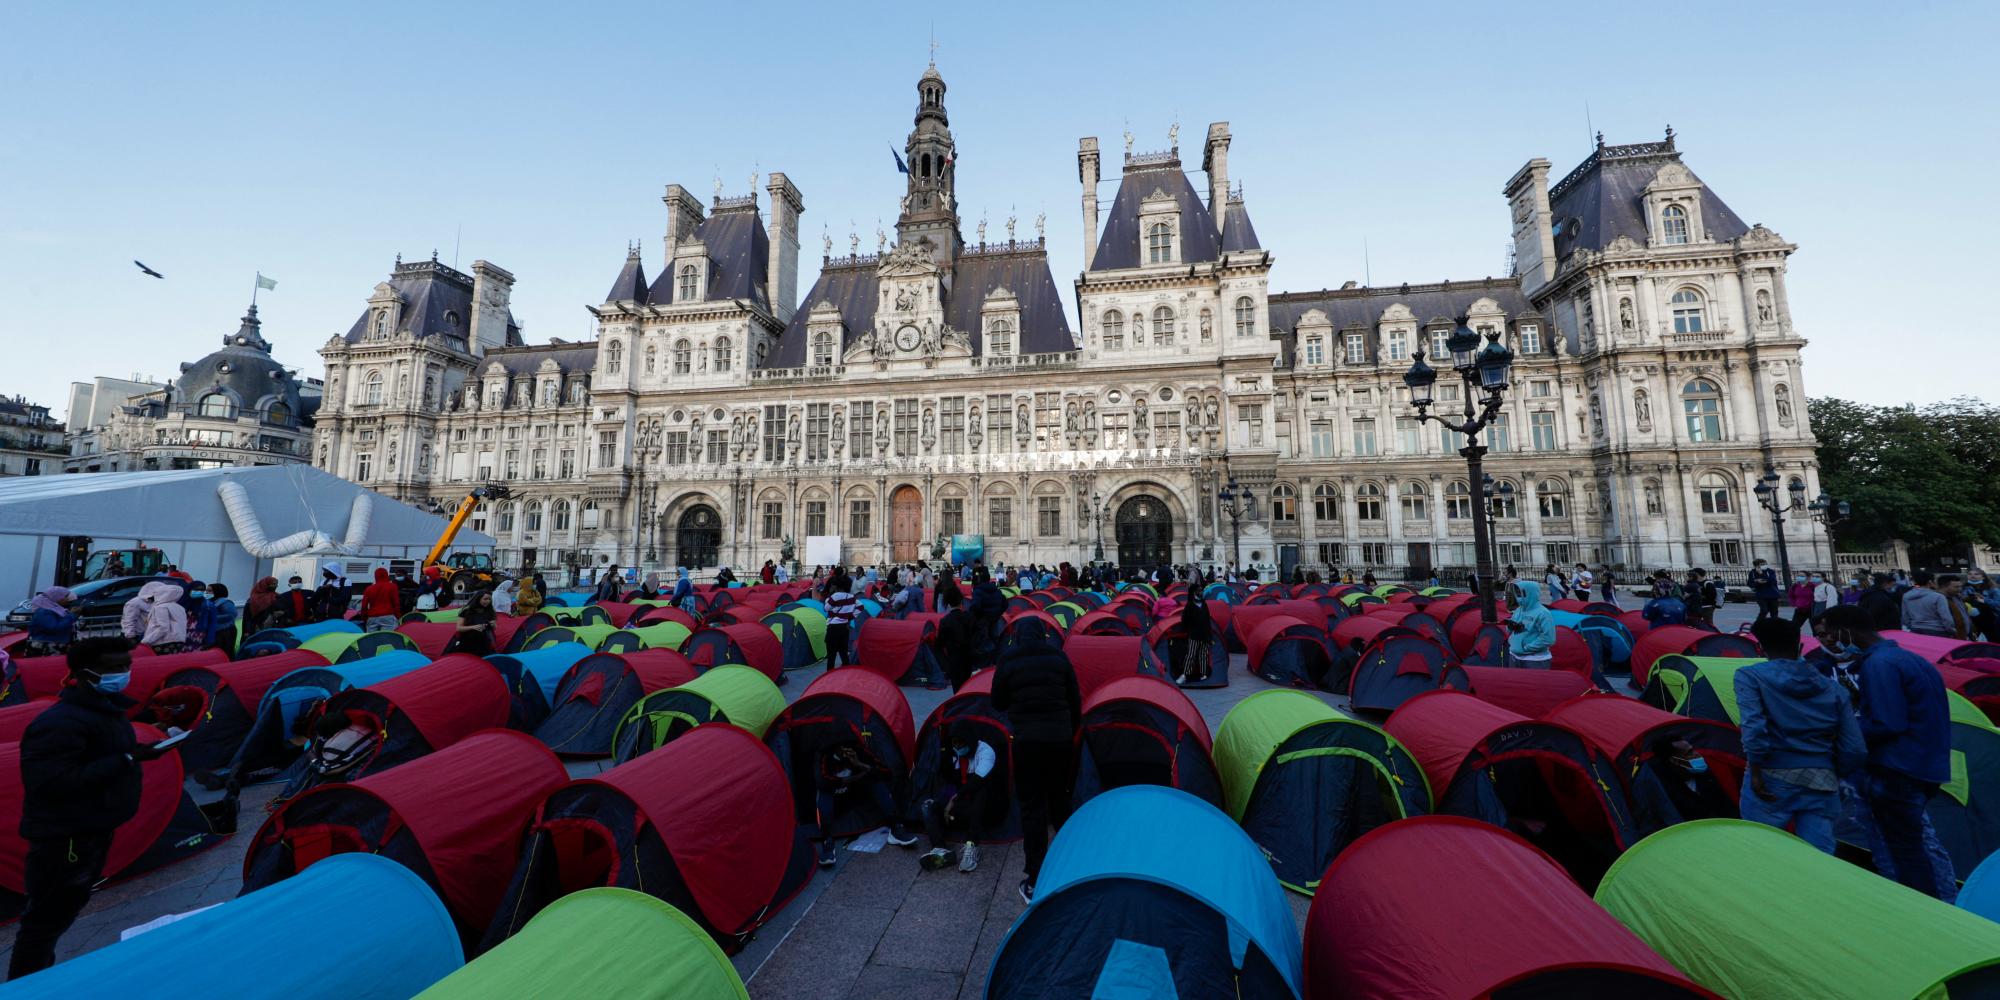 Photo GEOFFROY VAN DER HASSELT / AFP